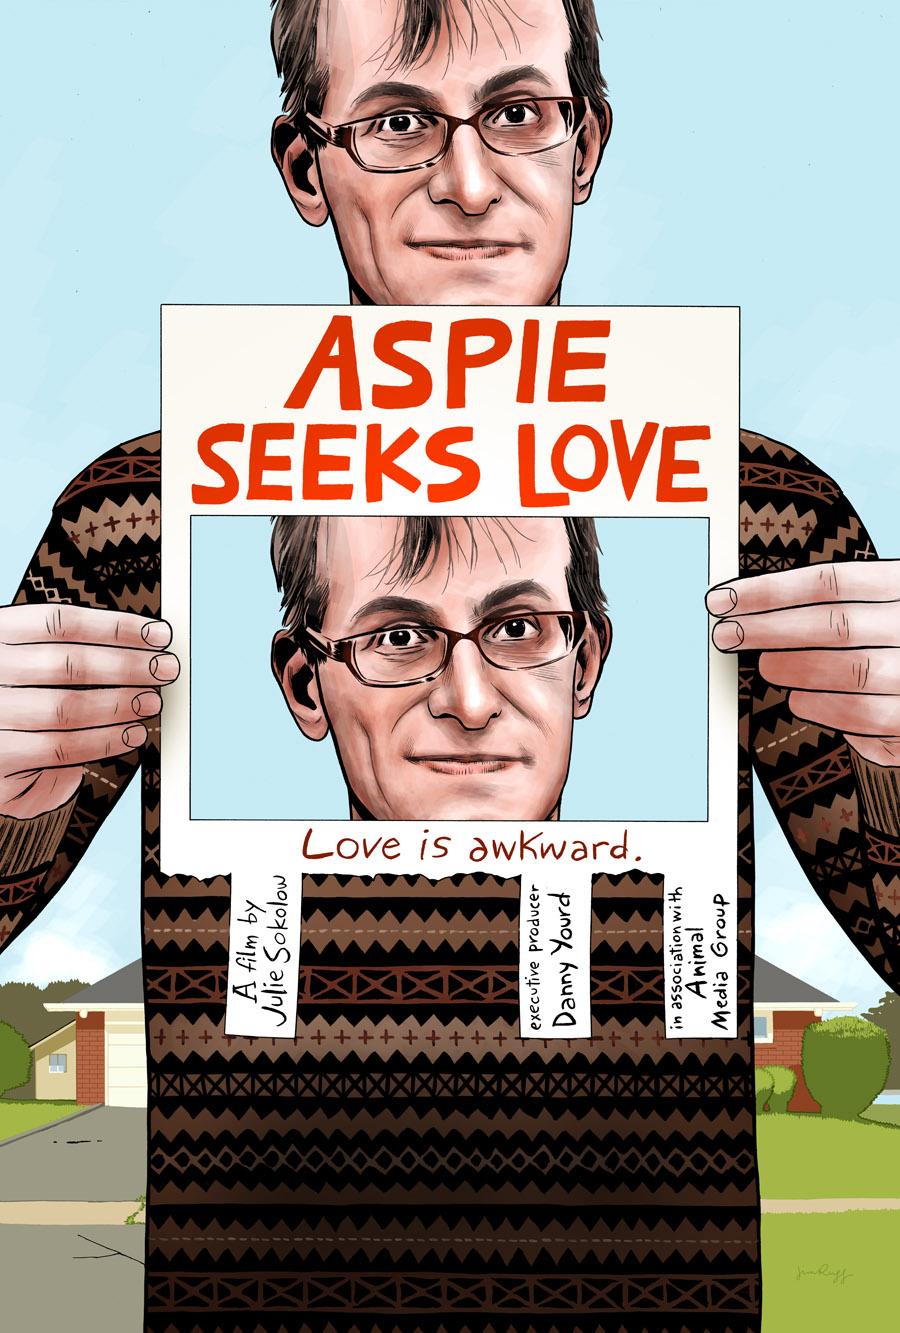 Film Documentary, 'Aspie Seeks Love' documents twenty years of searching for true love